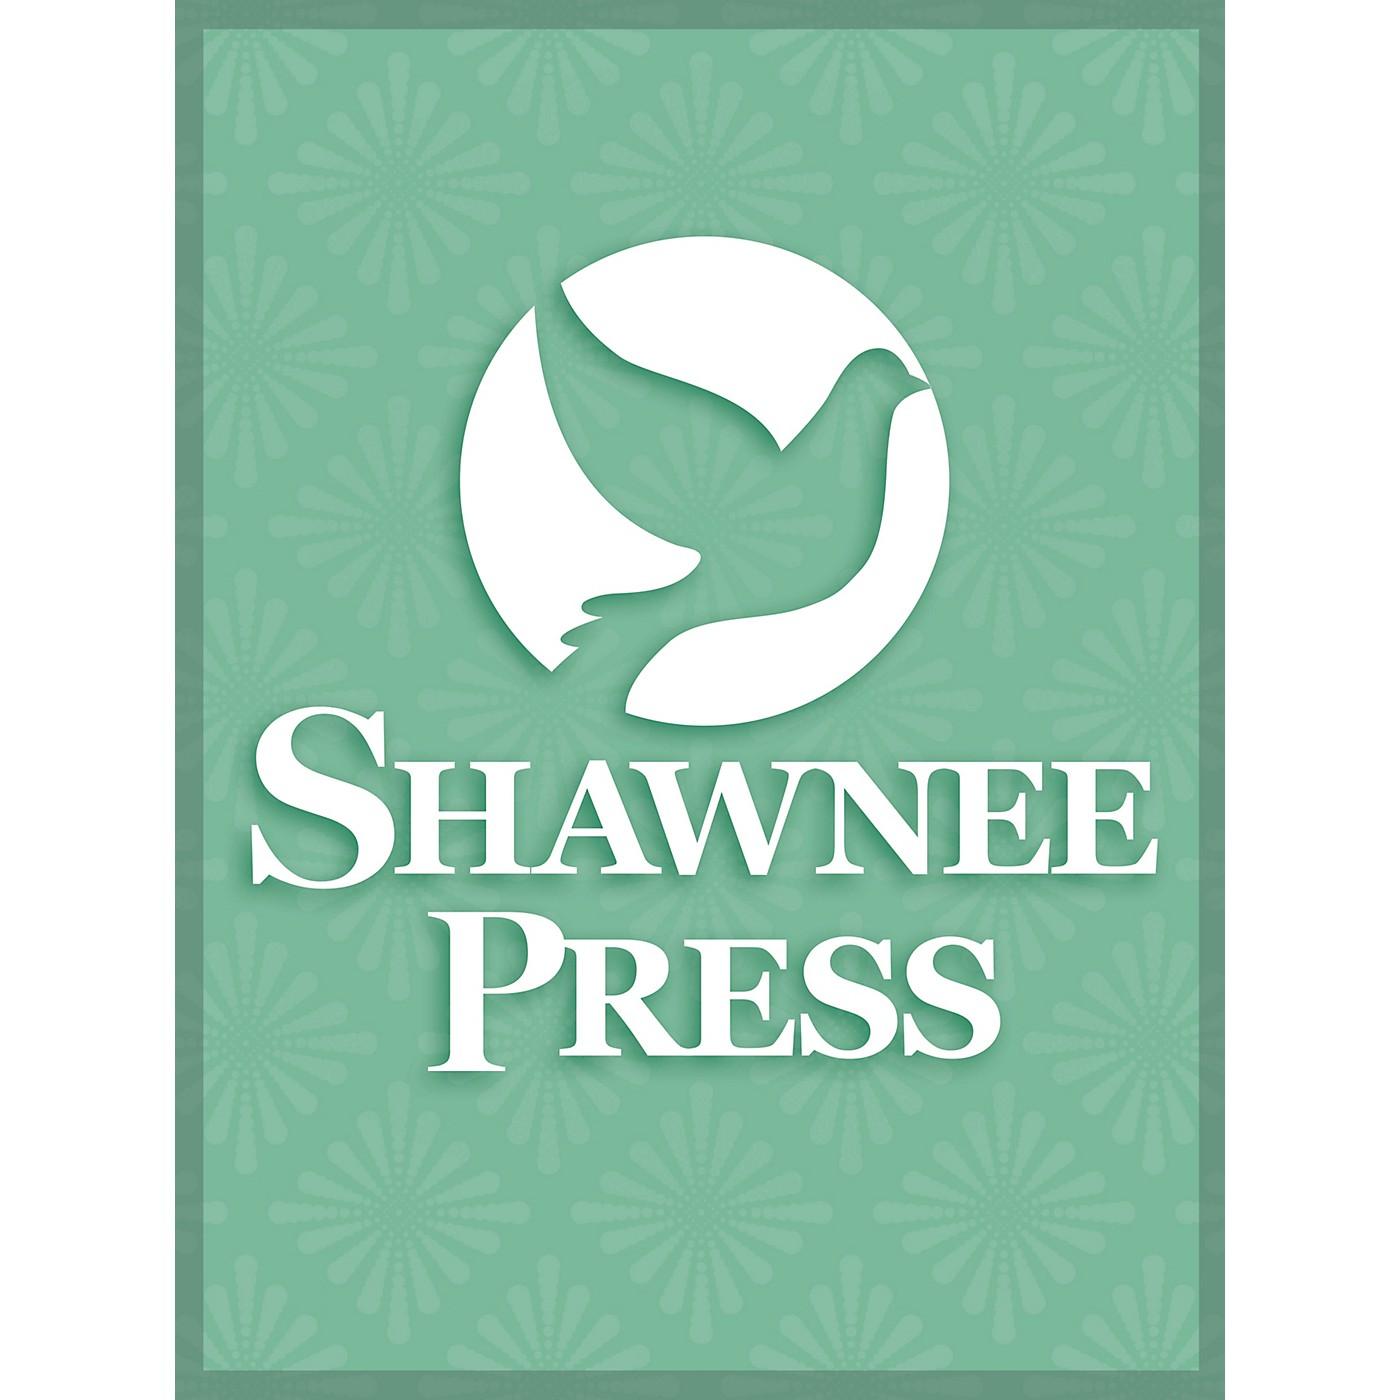 Shawnee Press Song of the Shepherd SATB Composed by Douglas Nolan thumbnail